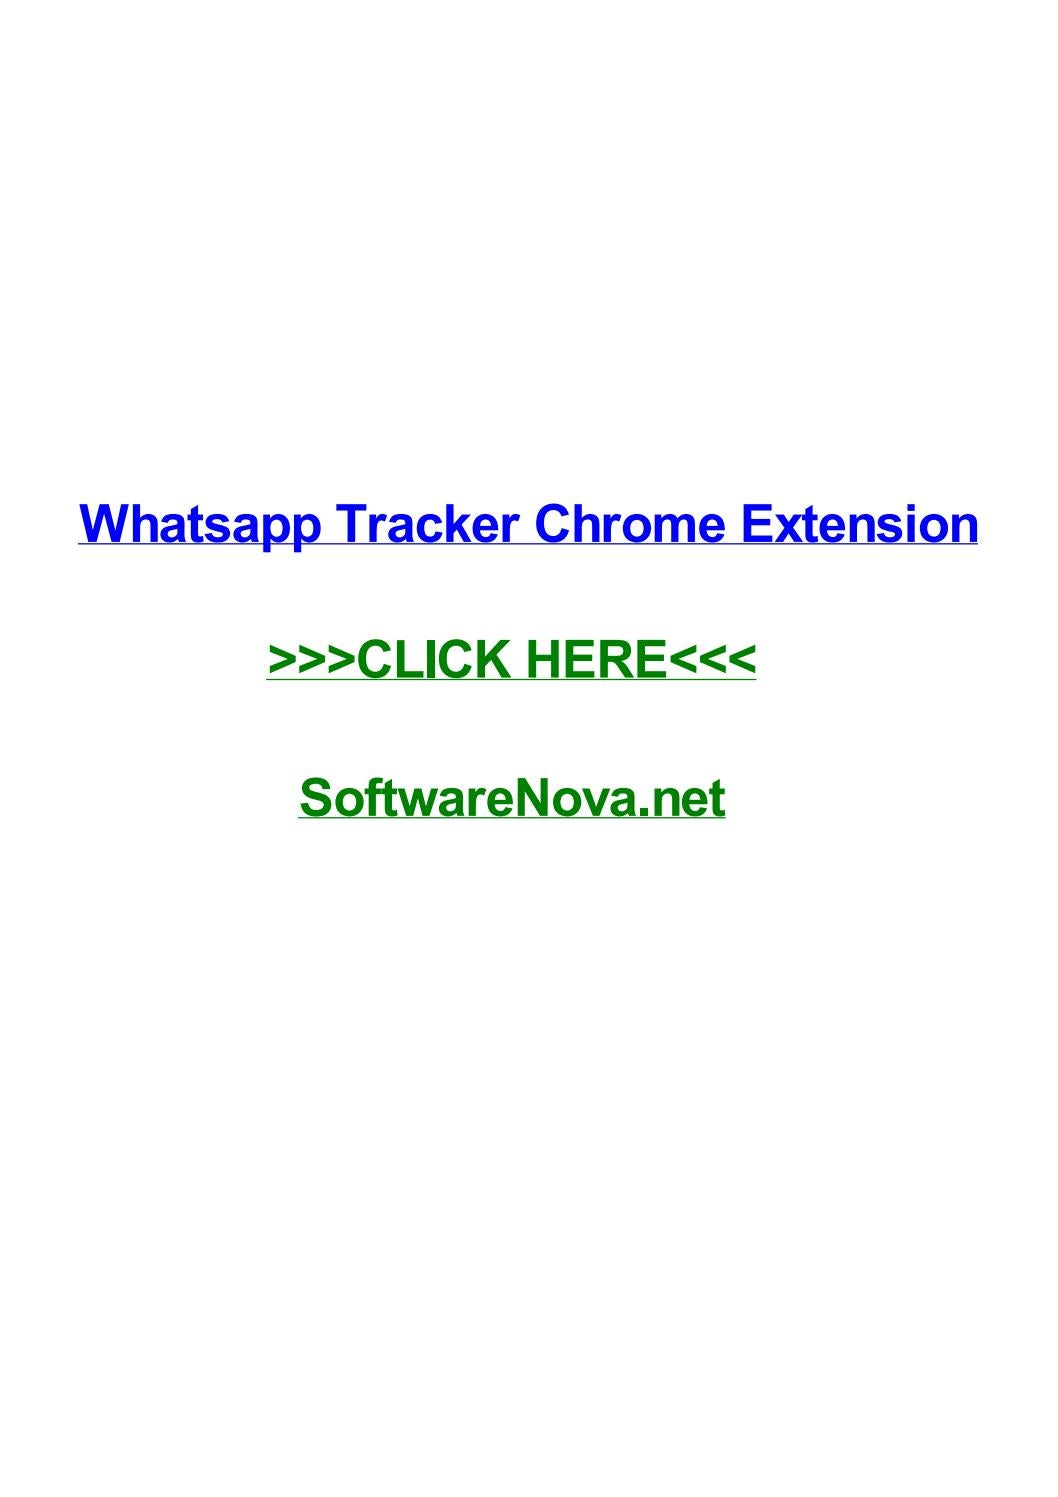 Whatsapp Tracker Chrome Extension By Melissadido Issuu